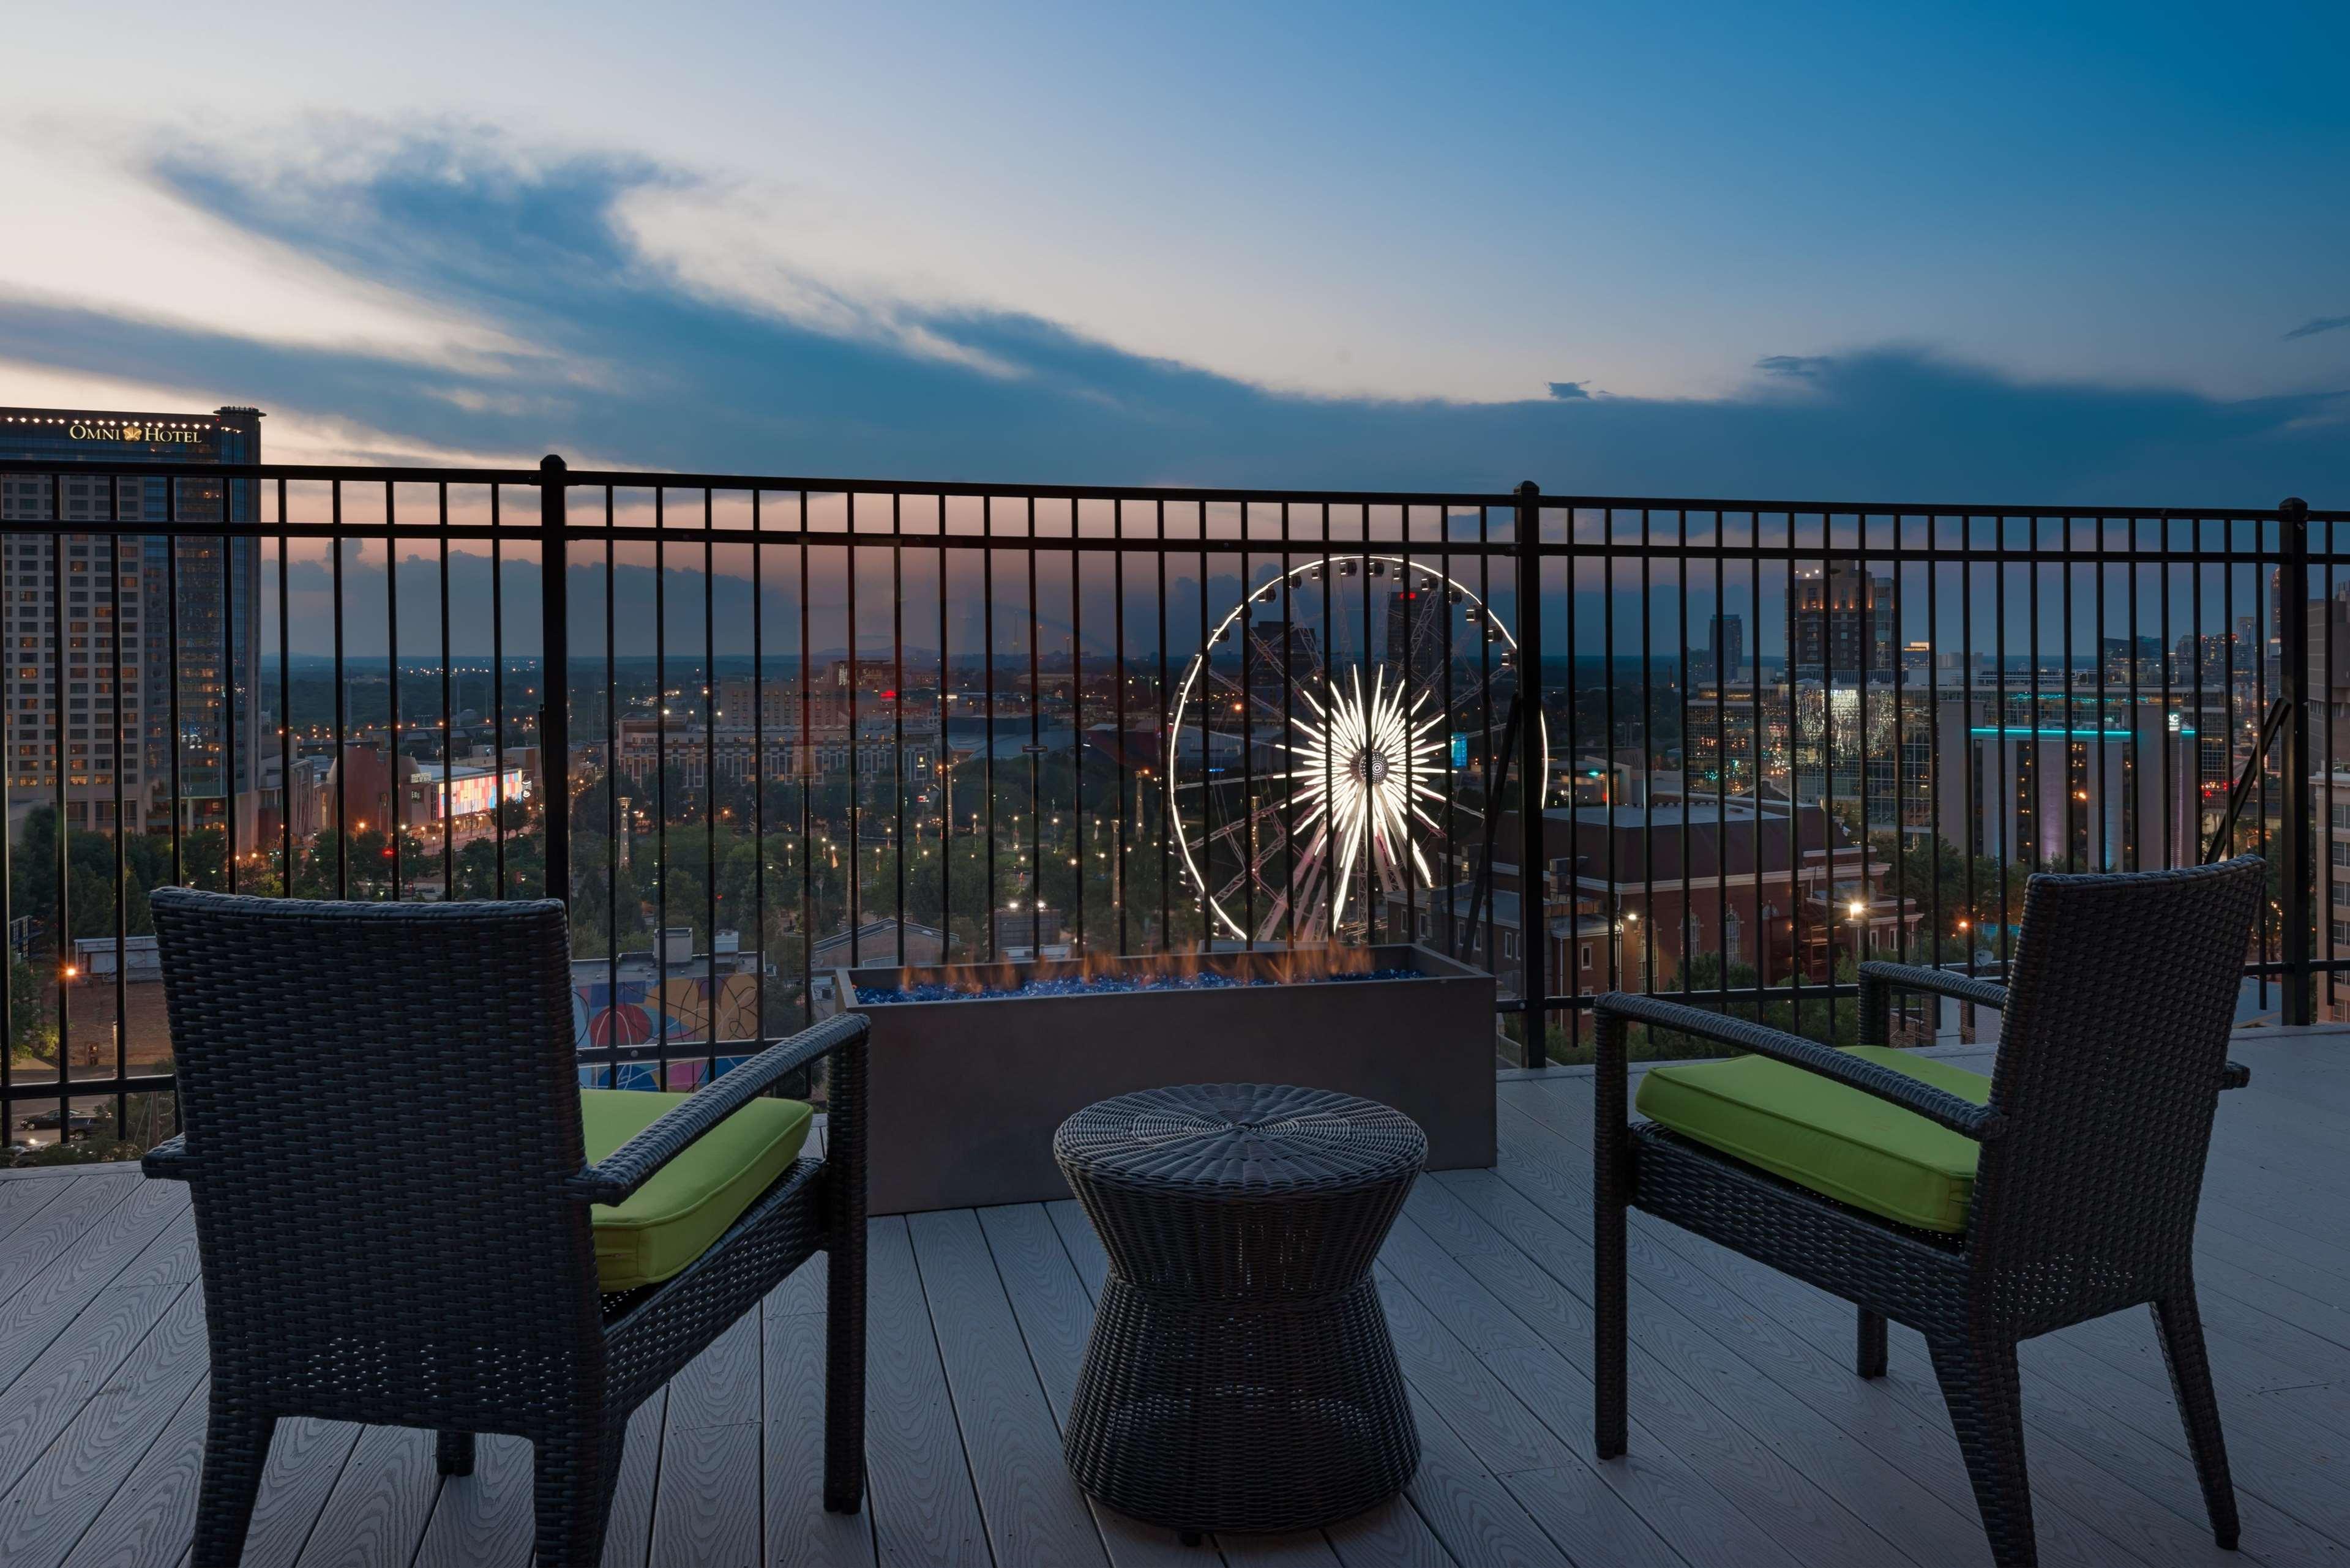 Home2 Suites by Hilton Atlanta Downtown image 31